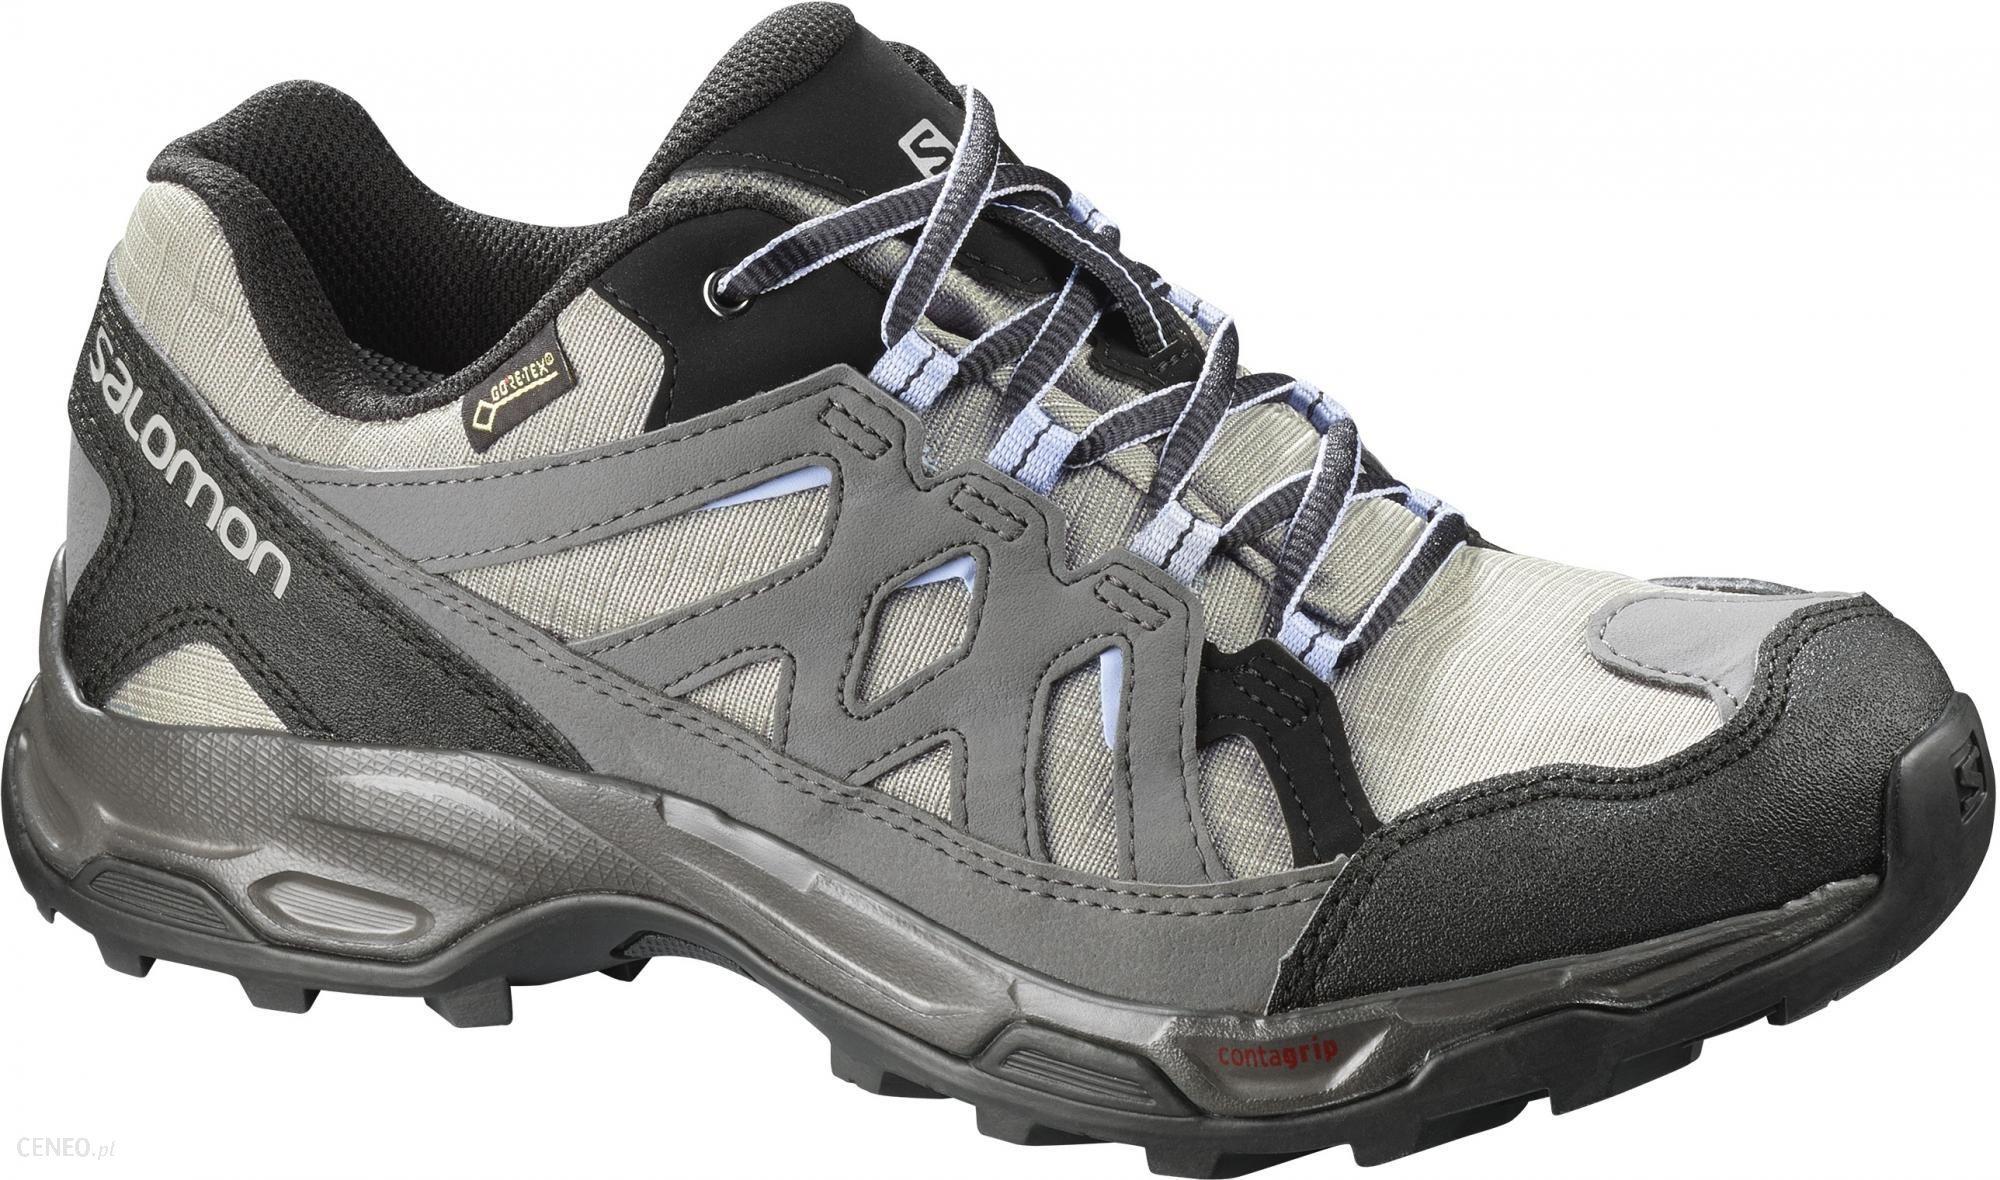 Buty trekkingowe Salomon Effect Gtx® W Frost Gray Magnet Easter E Ceny i opinie Ceneo.pl